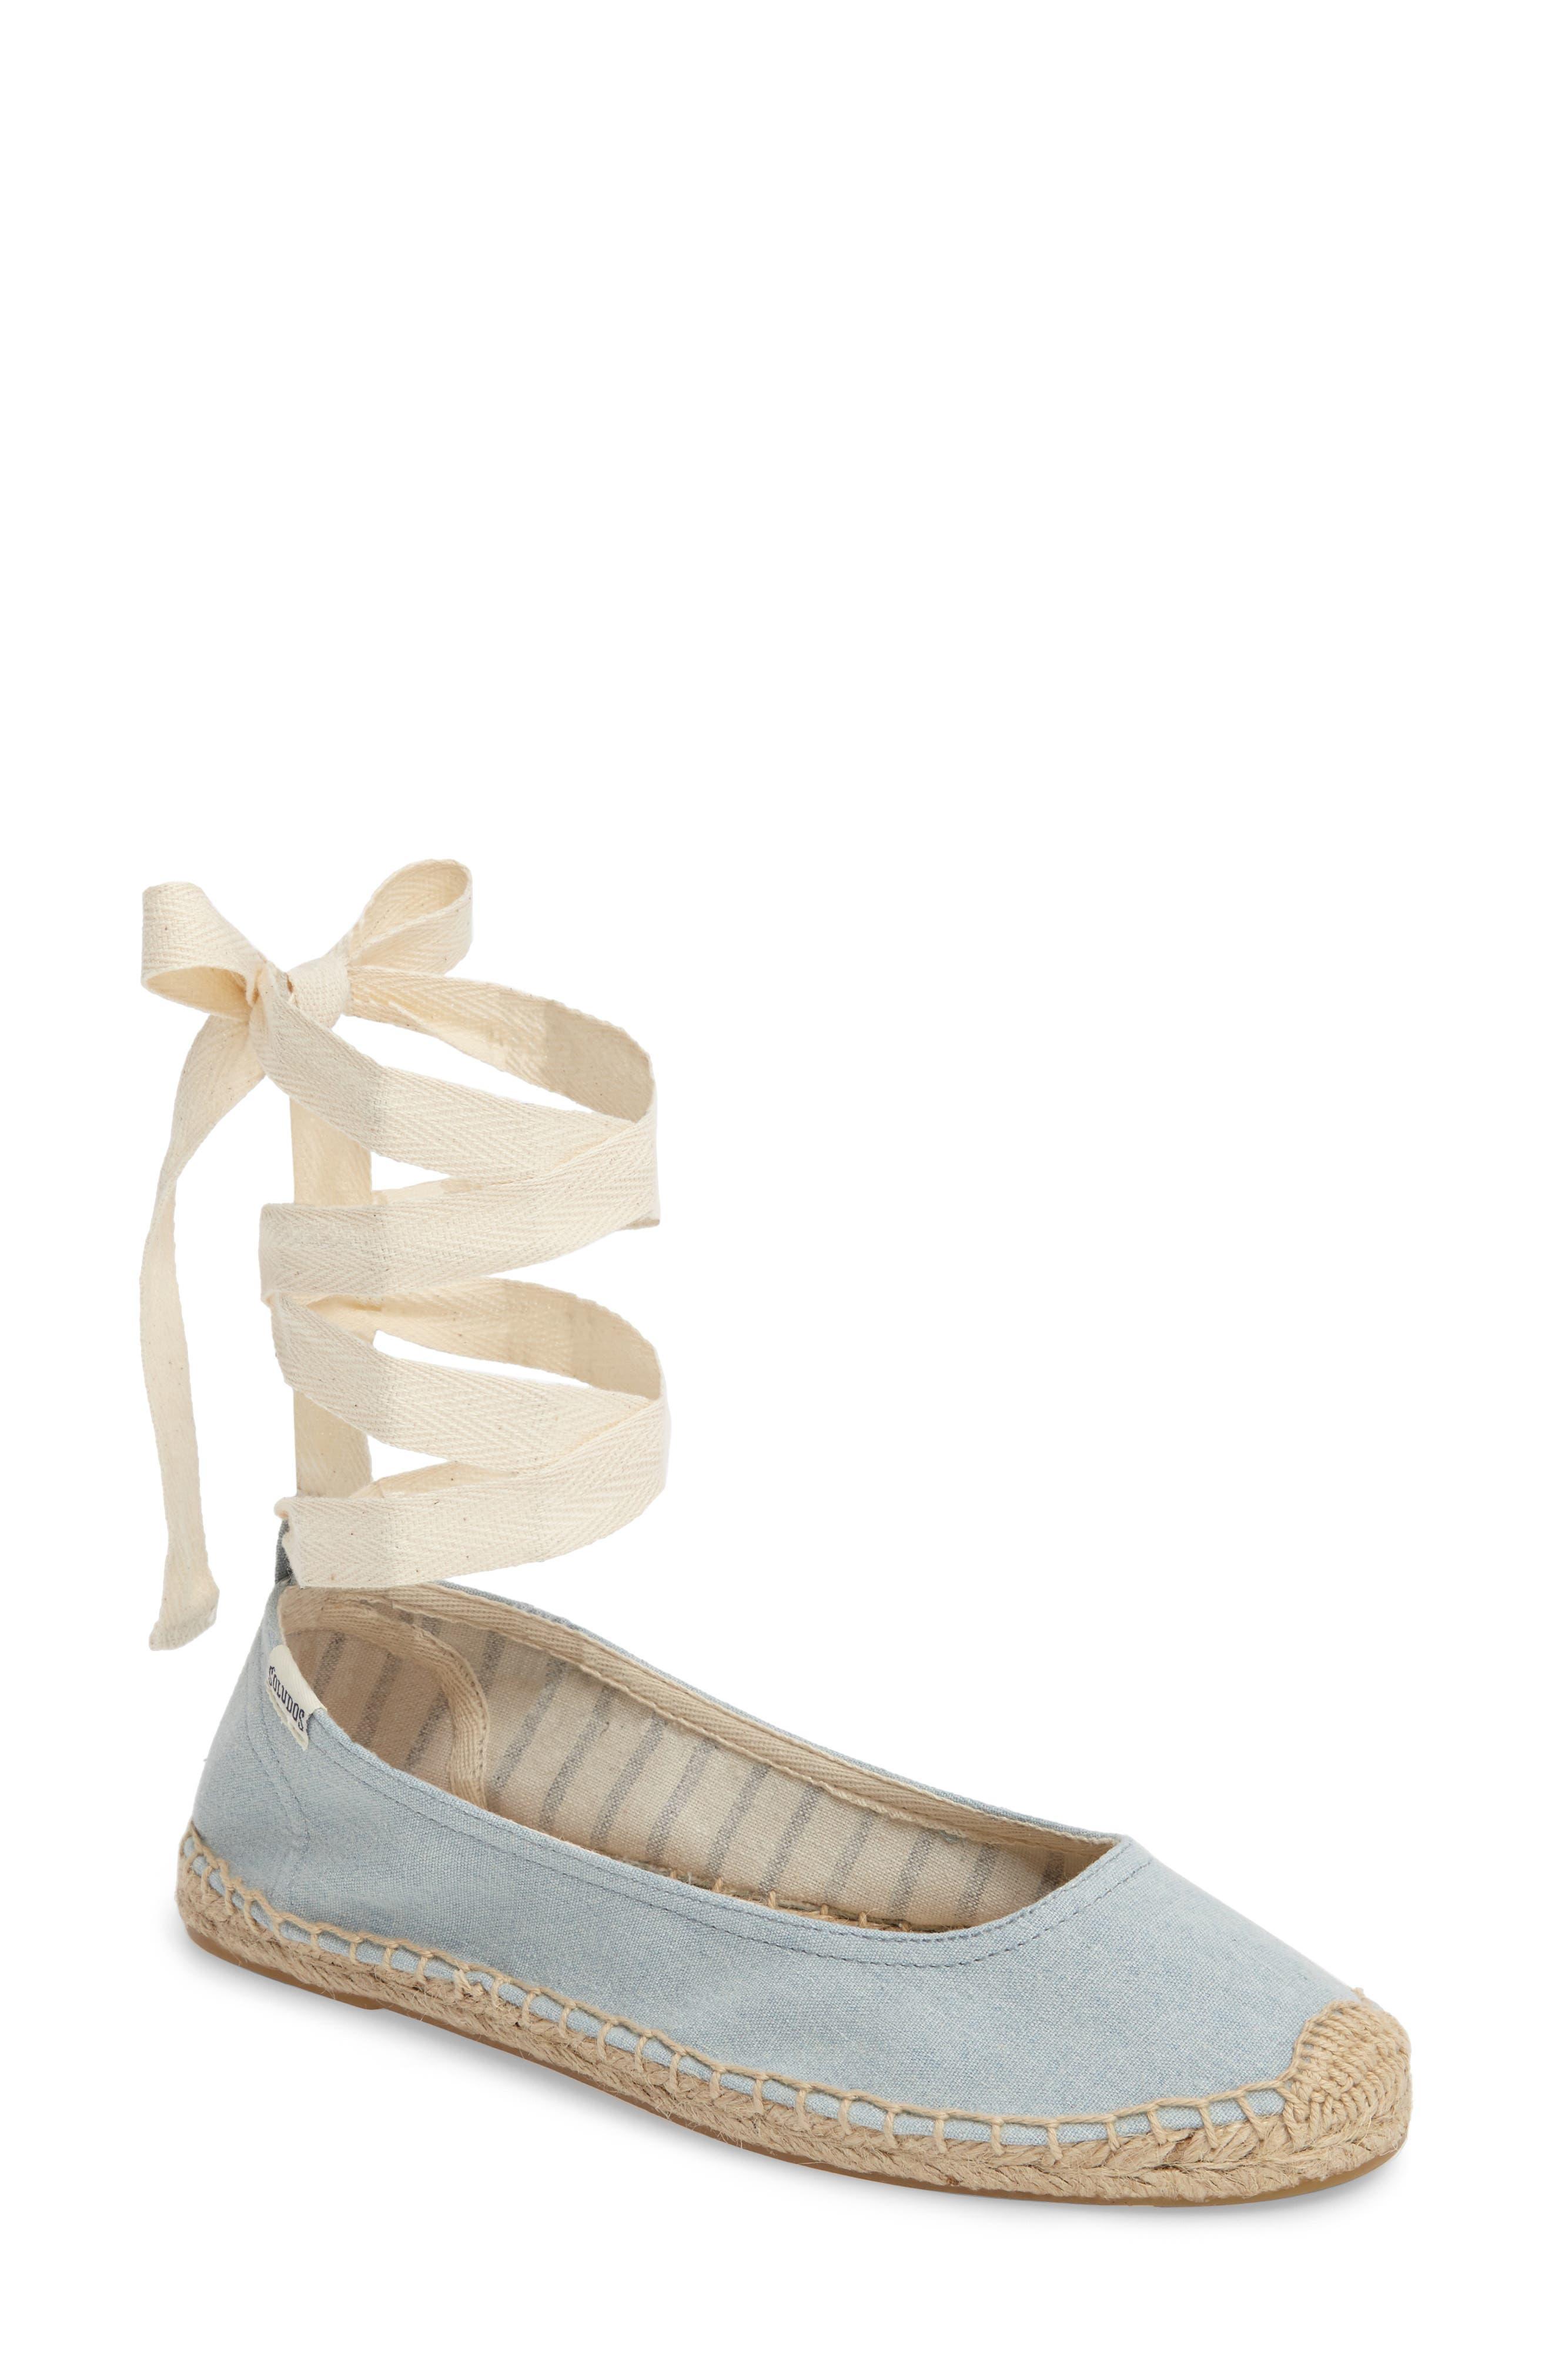 Soludos Ankle Tie Espadrille Flat (Women)